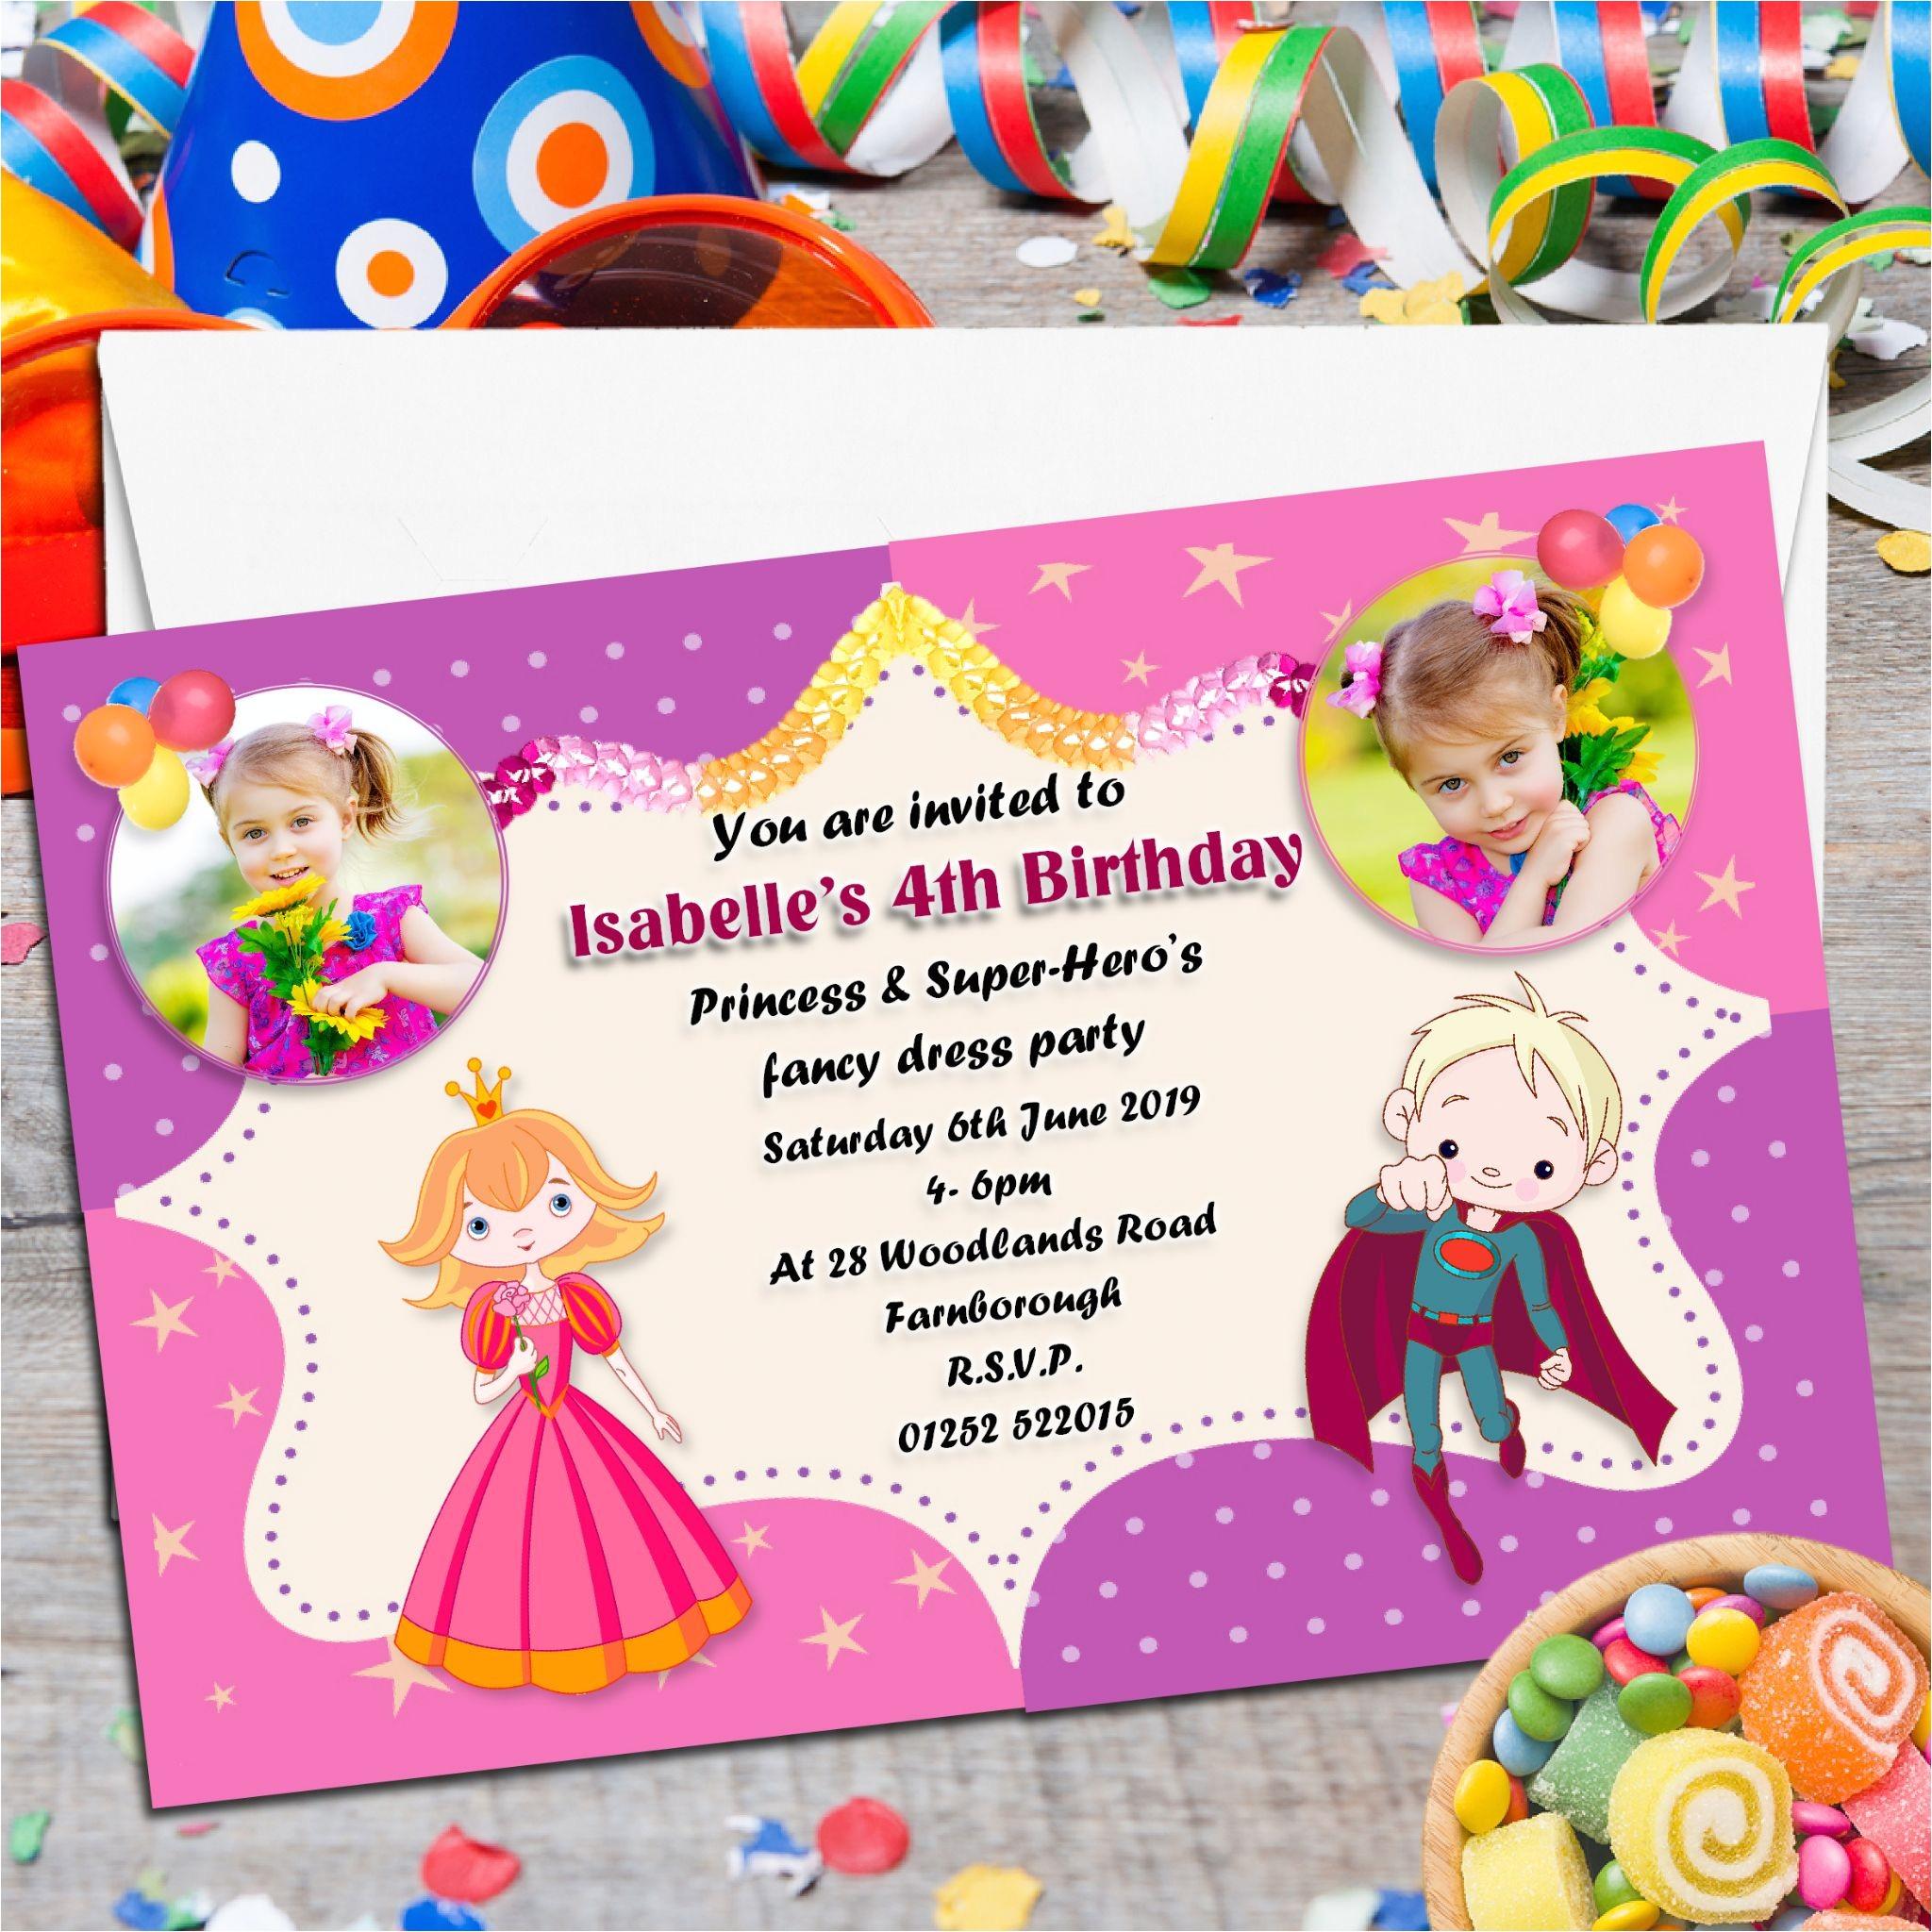 10 personalised princess super heros birthday party photo invitations n88 4273 p